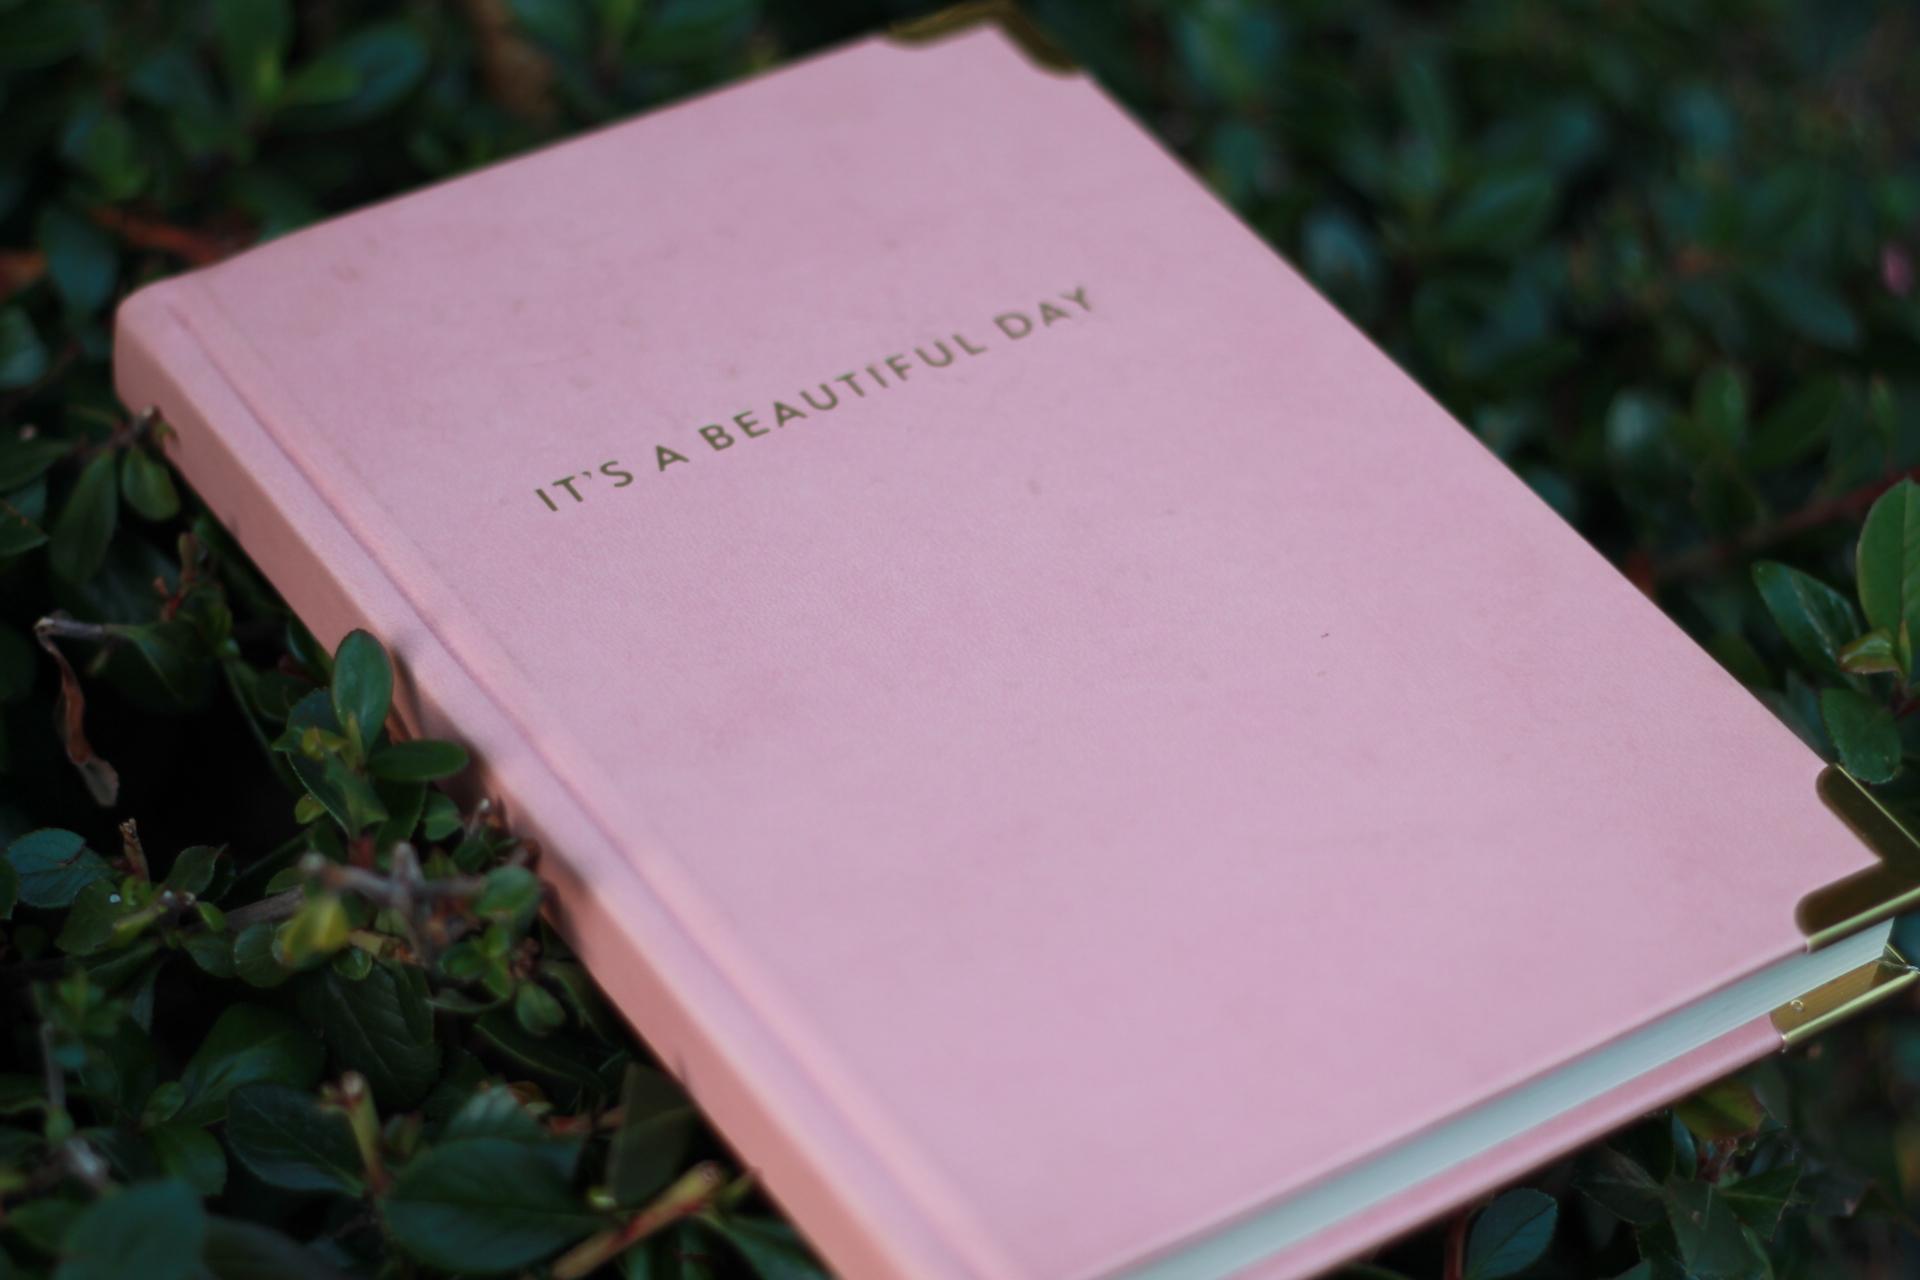 Pretty pink journal